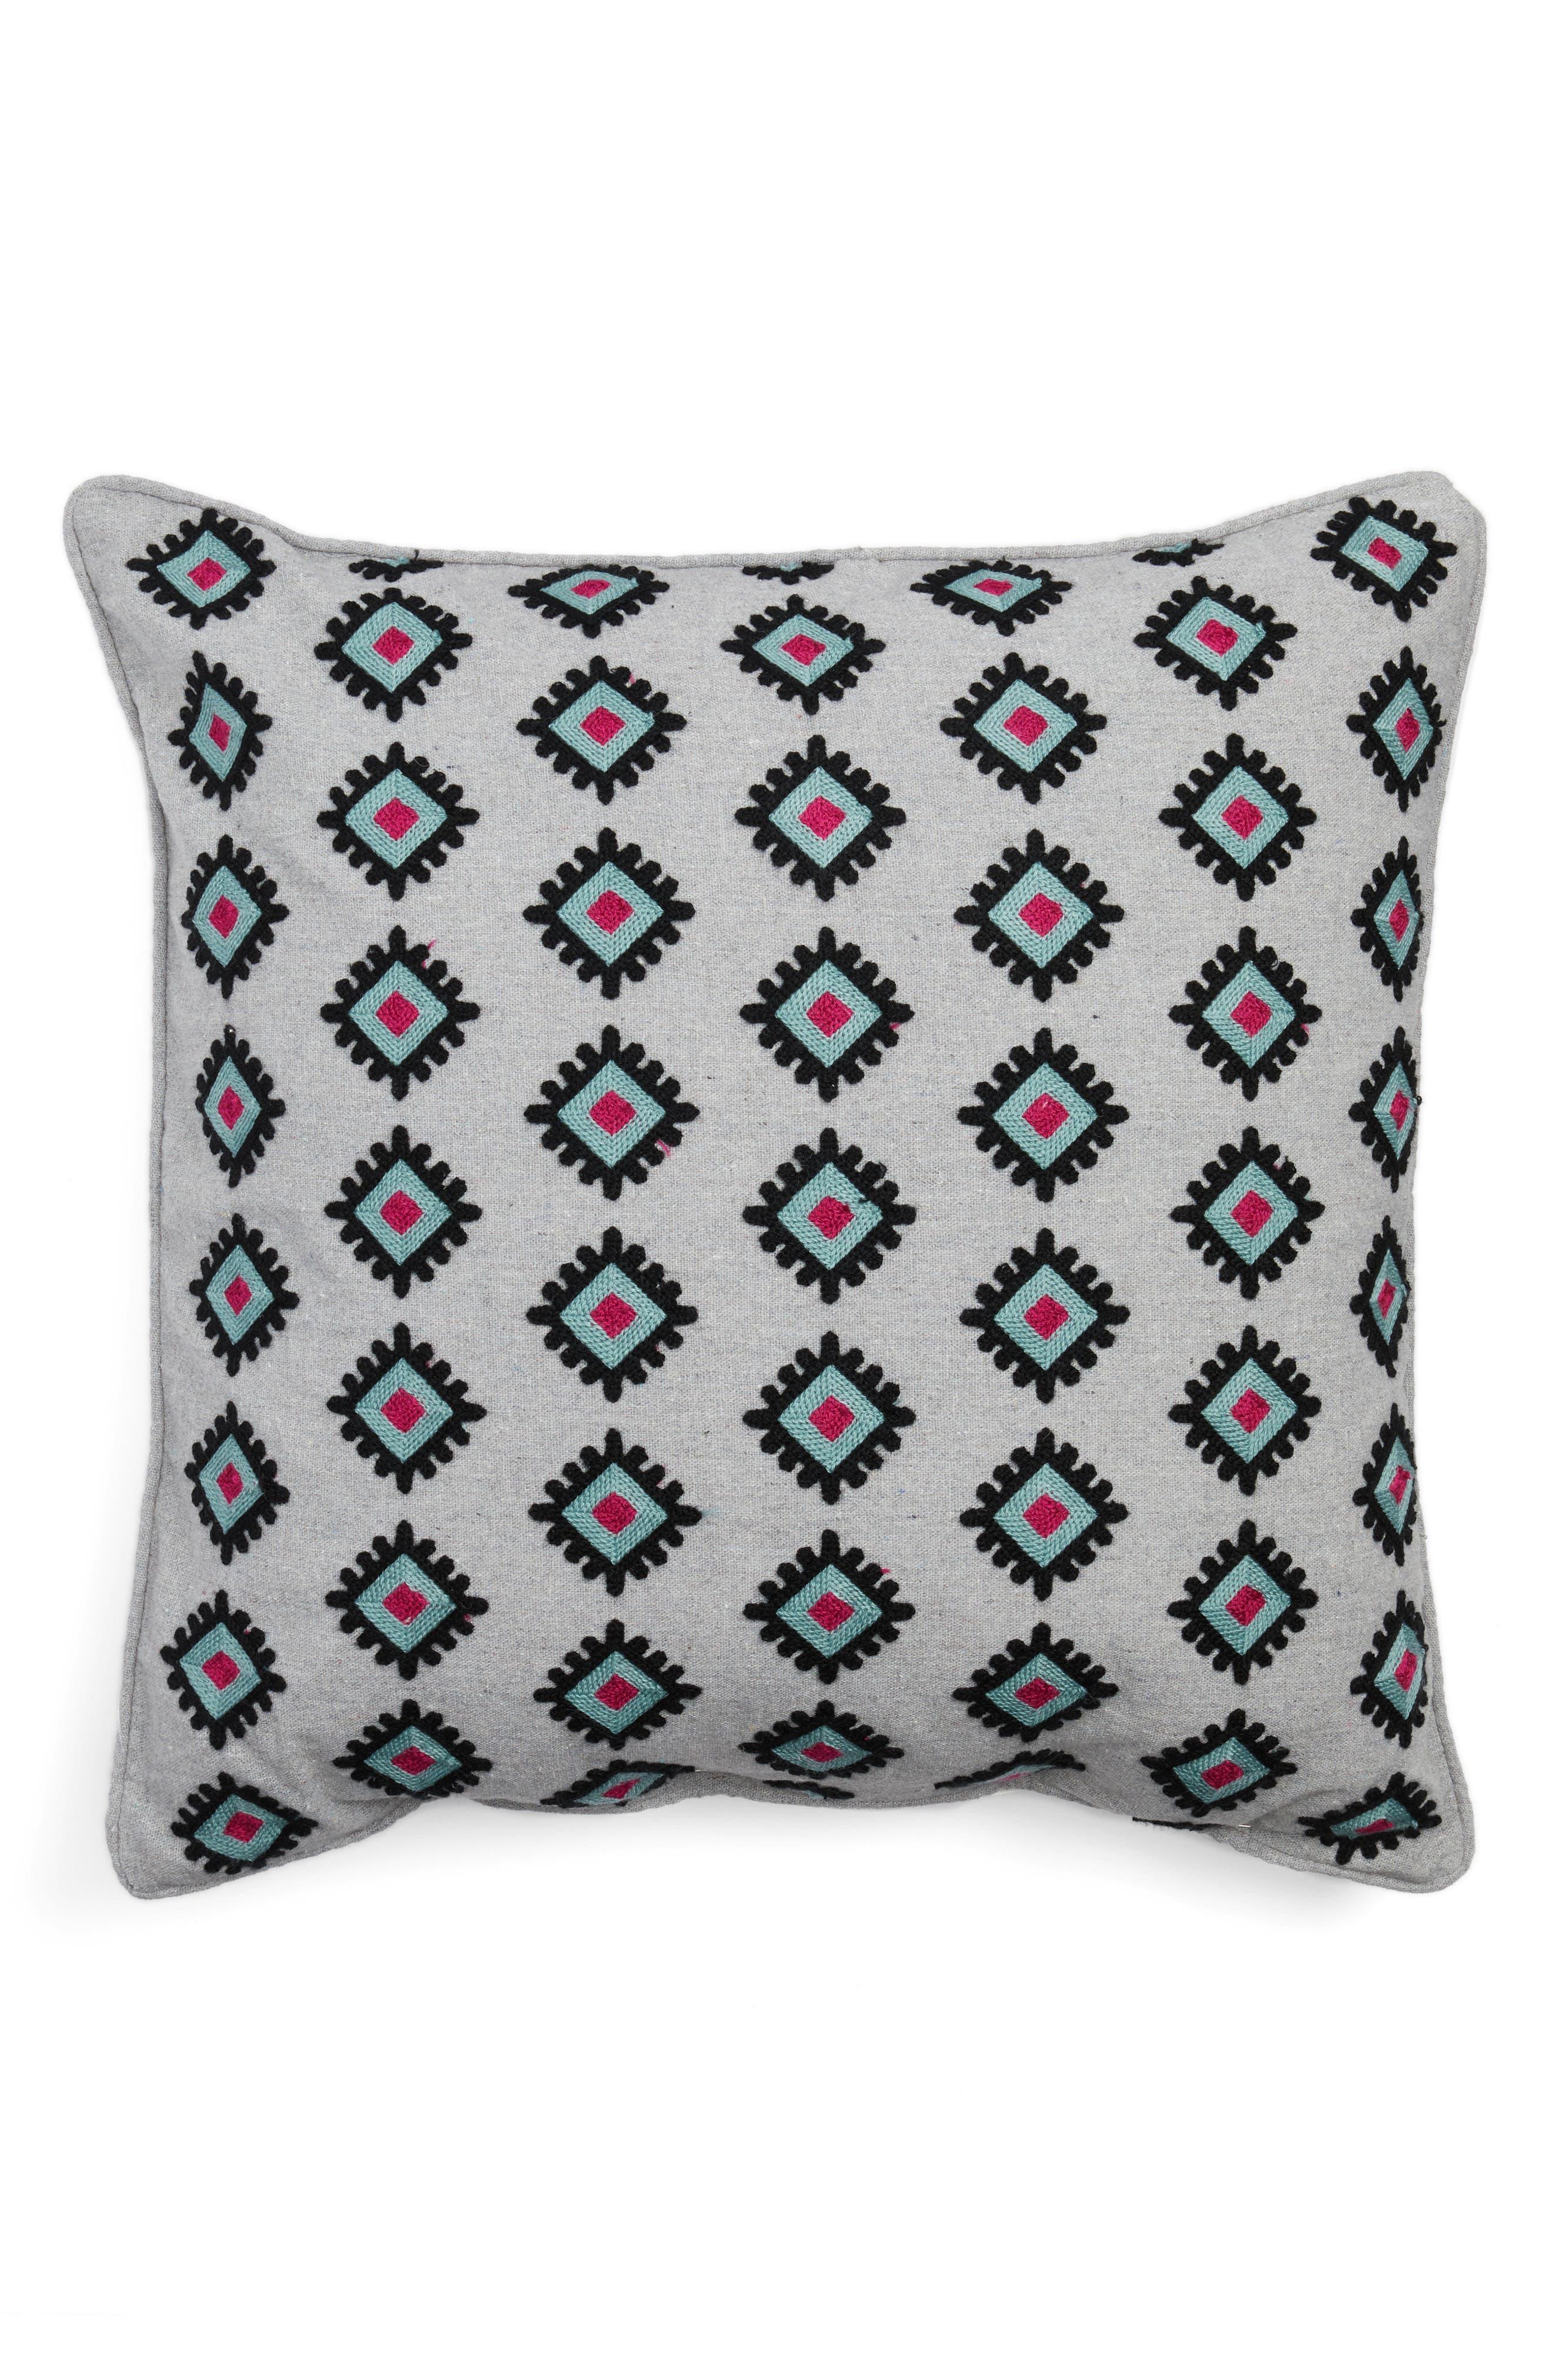 Nala Towel Stitch Accent Pillow,                         Main,                         color, Grey